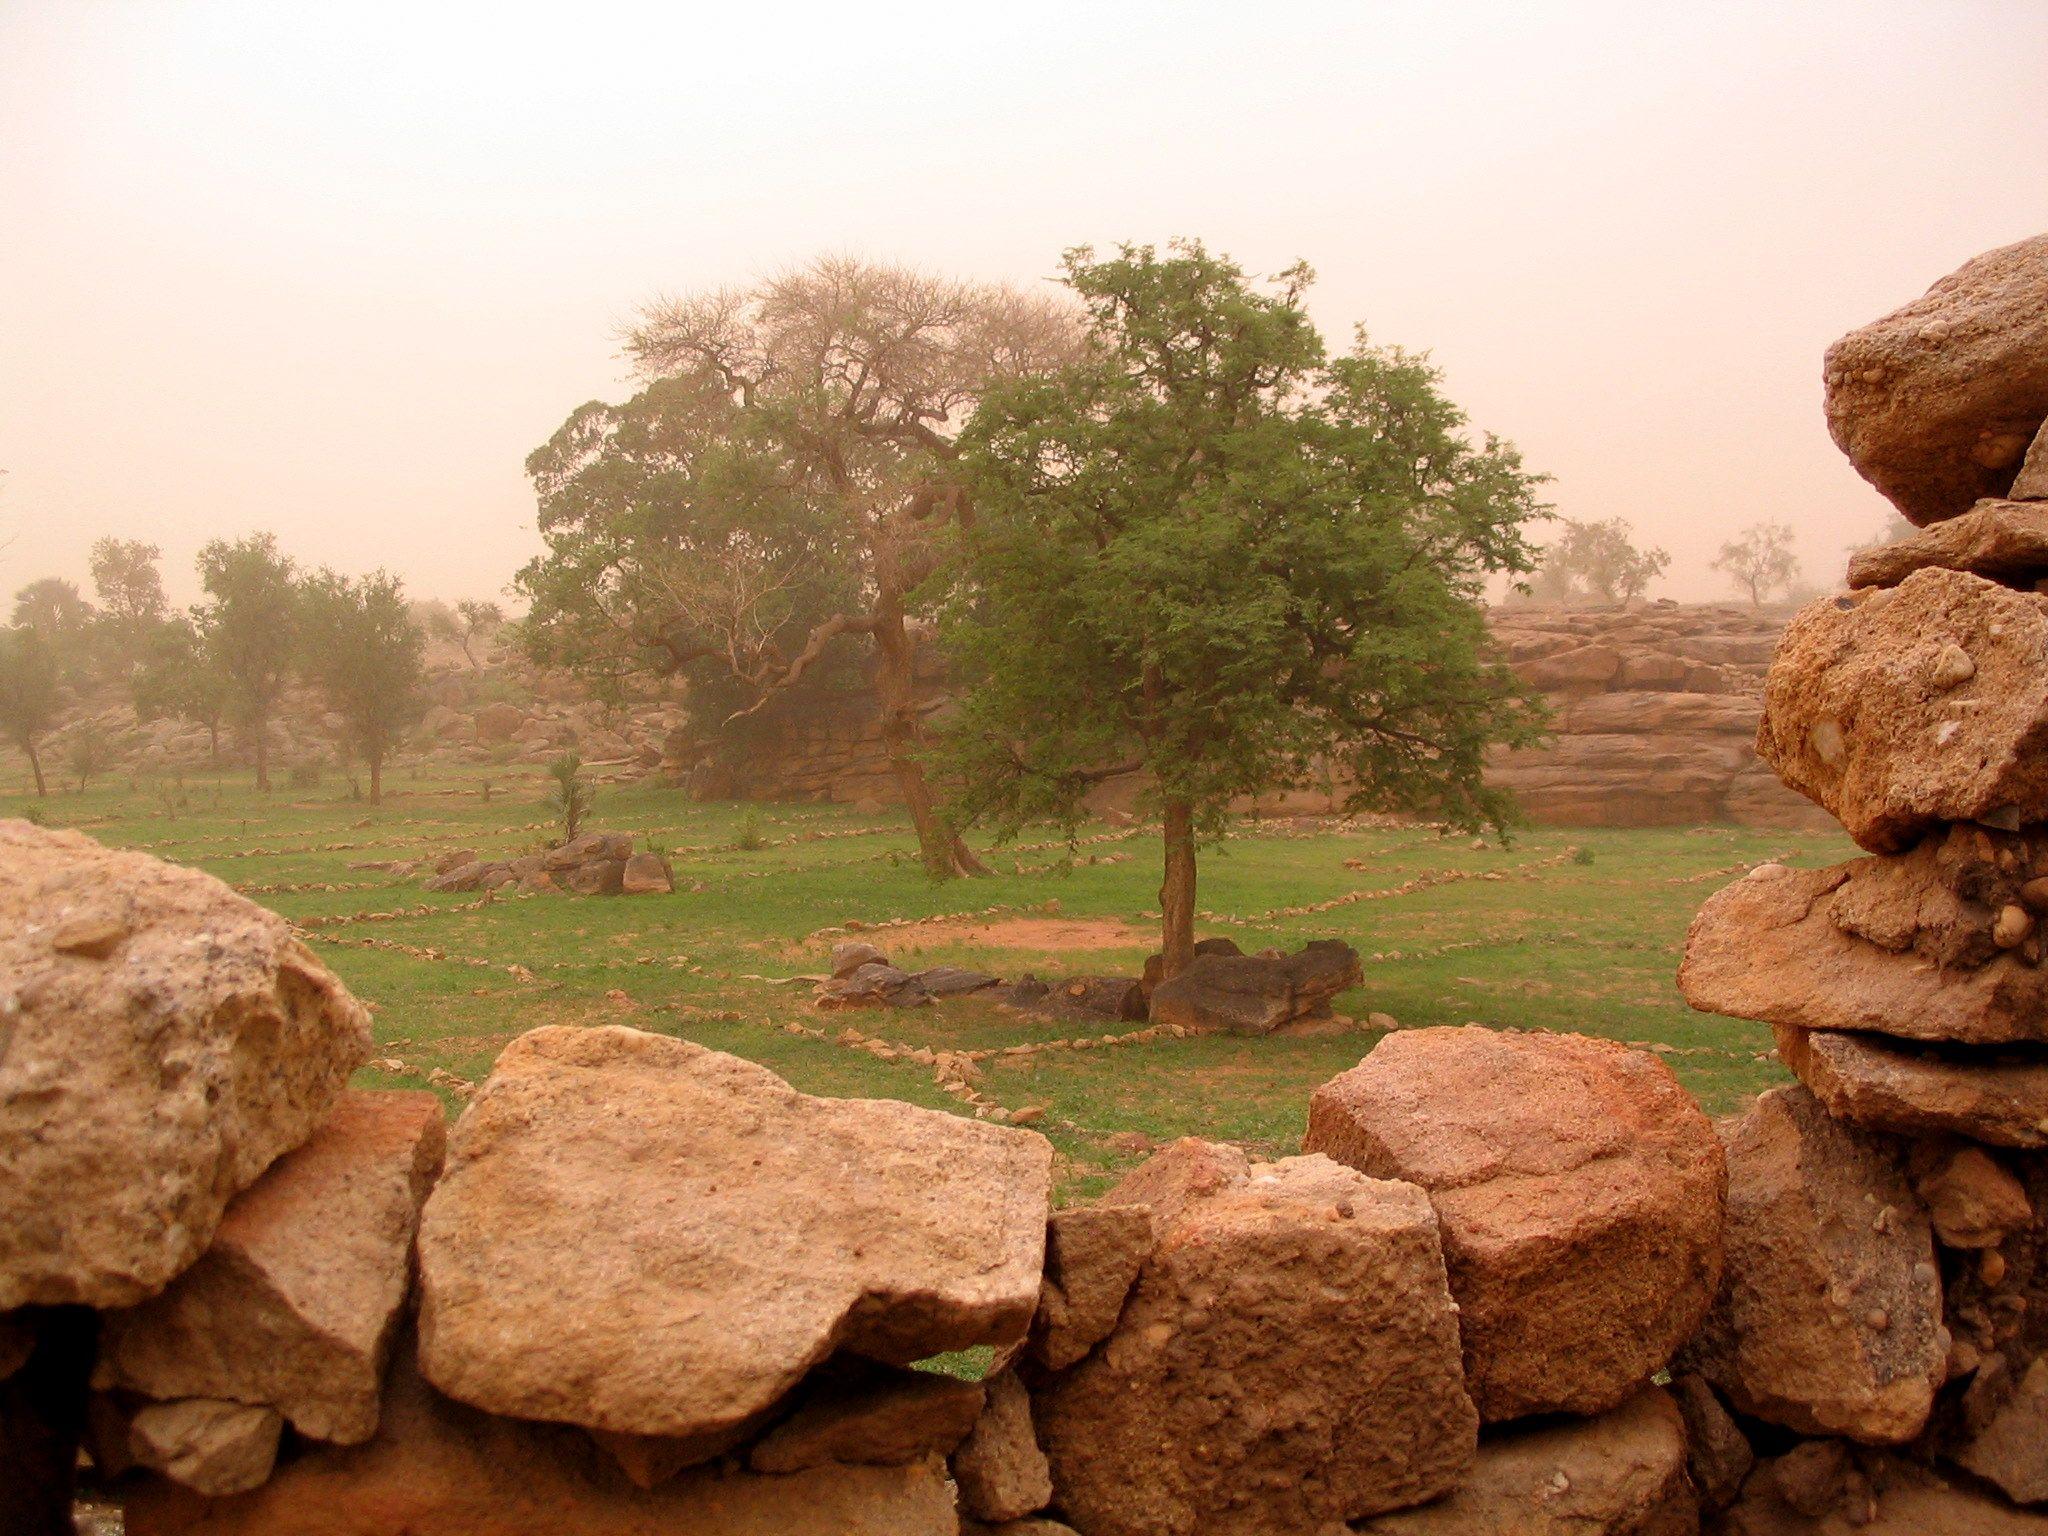 Mali Country Country Mali Landscape